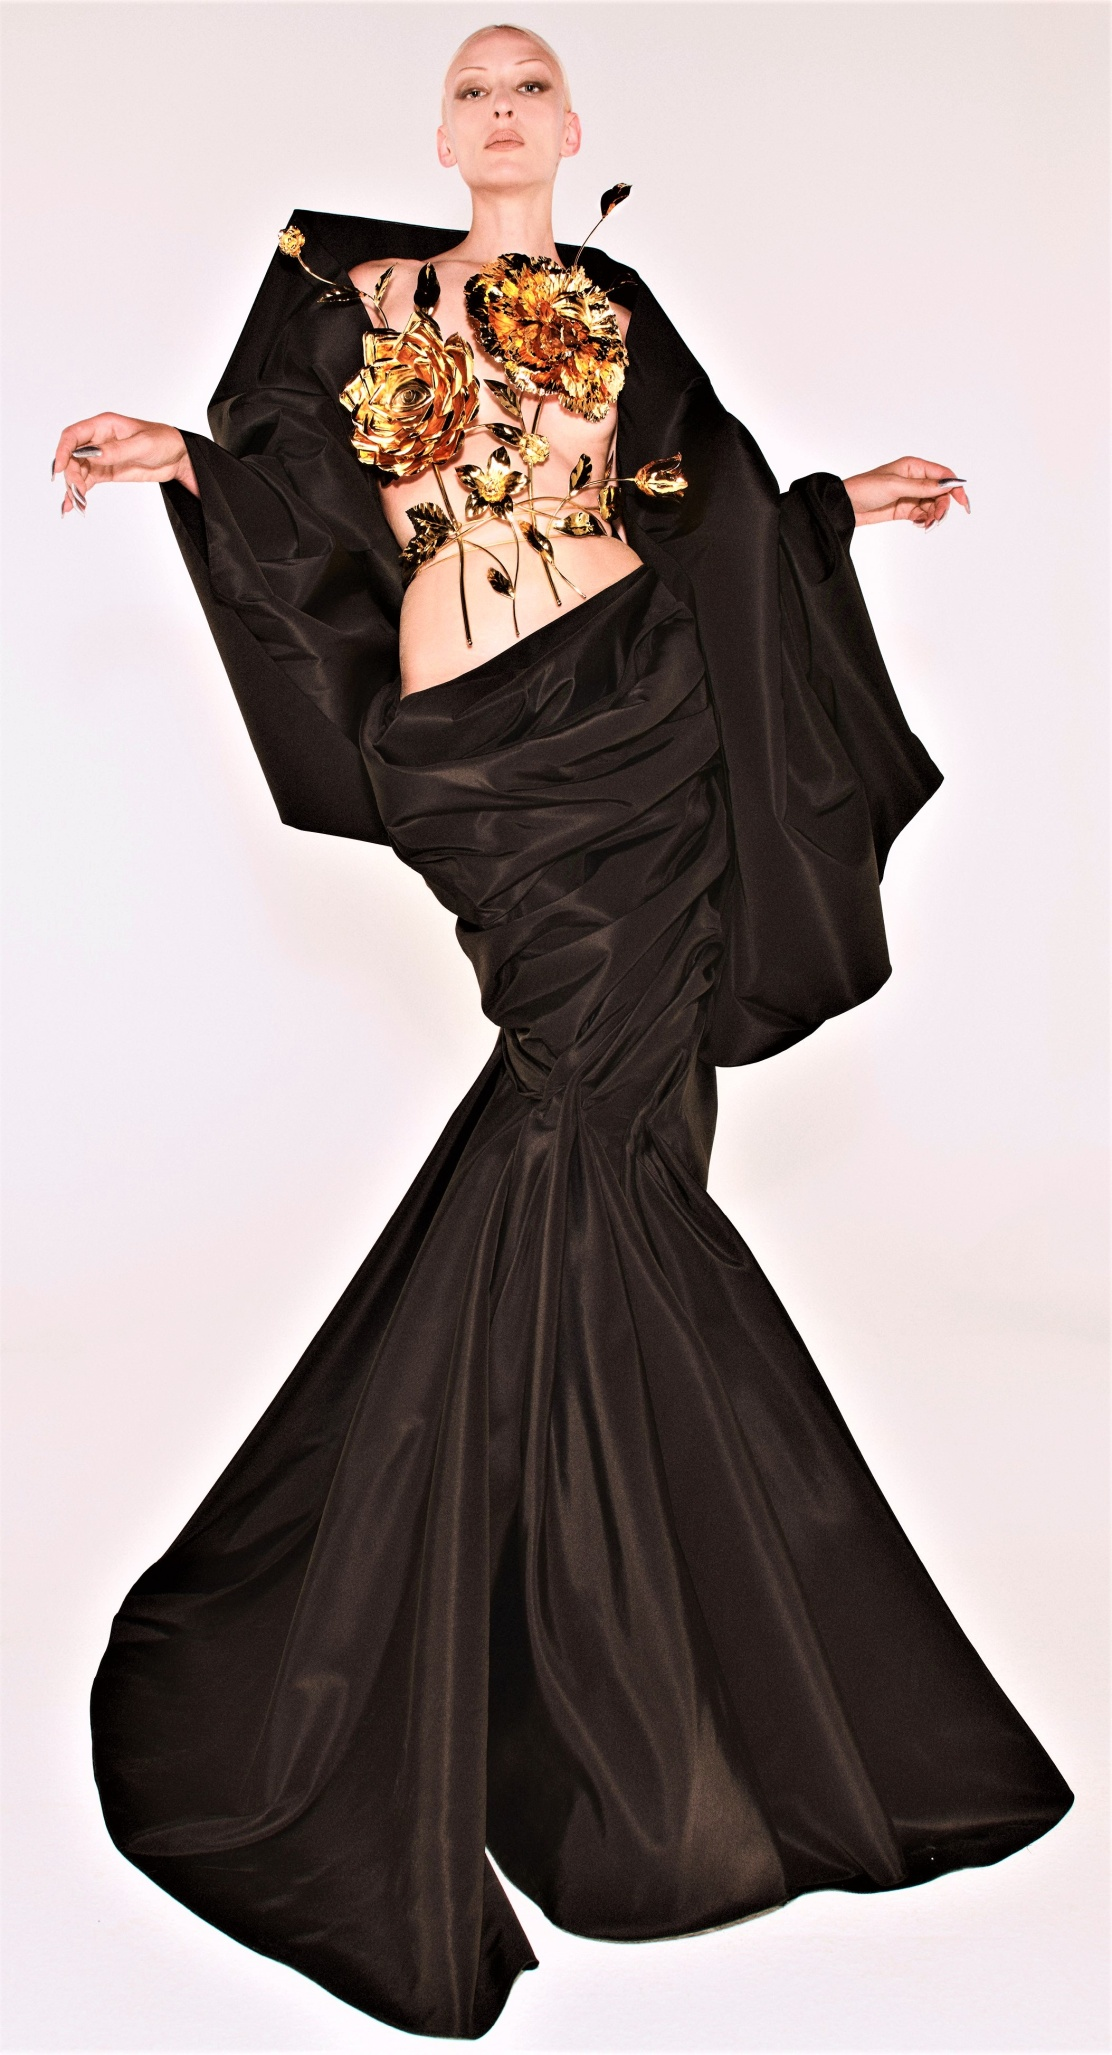 Schiaparelli Couture-Fall 21 gold flowers vogue cropped.jpg